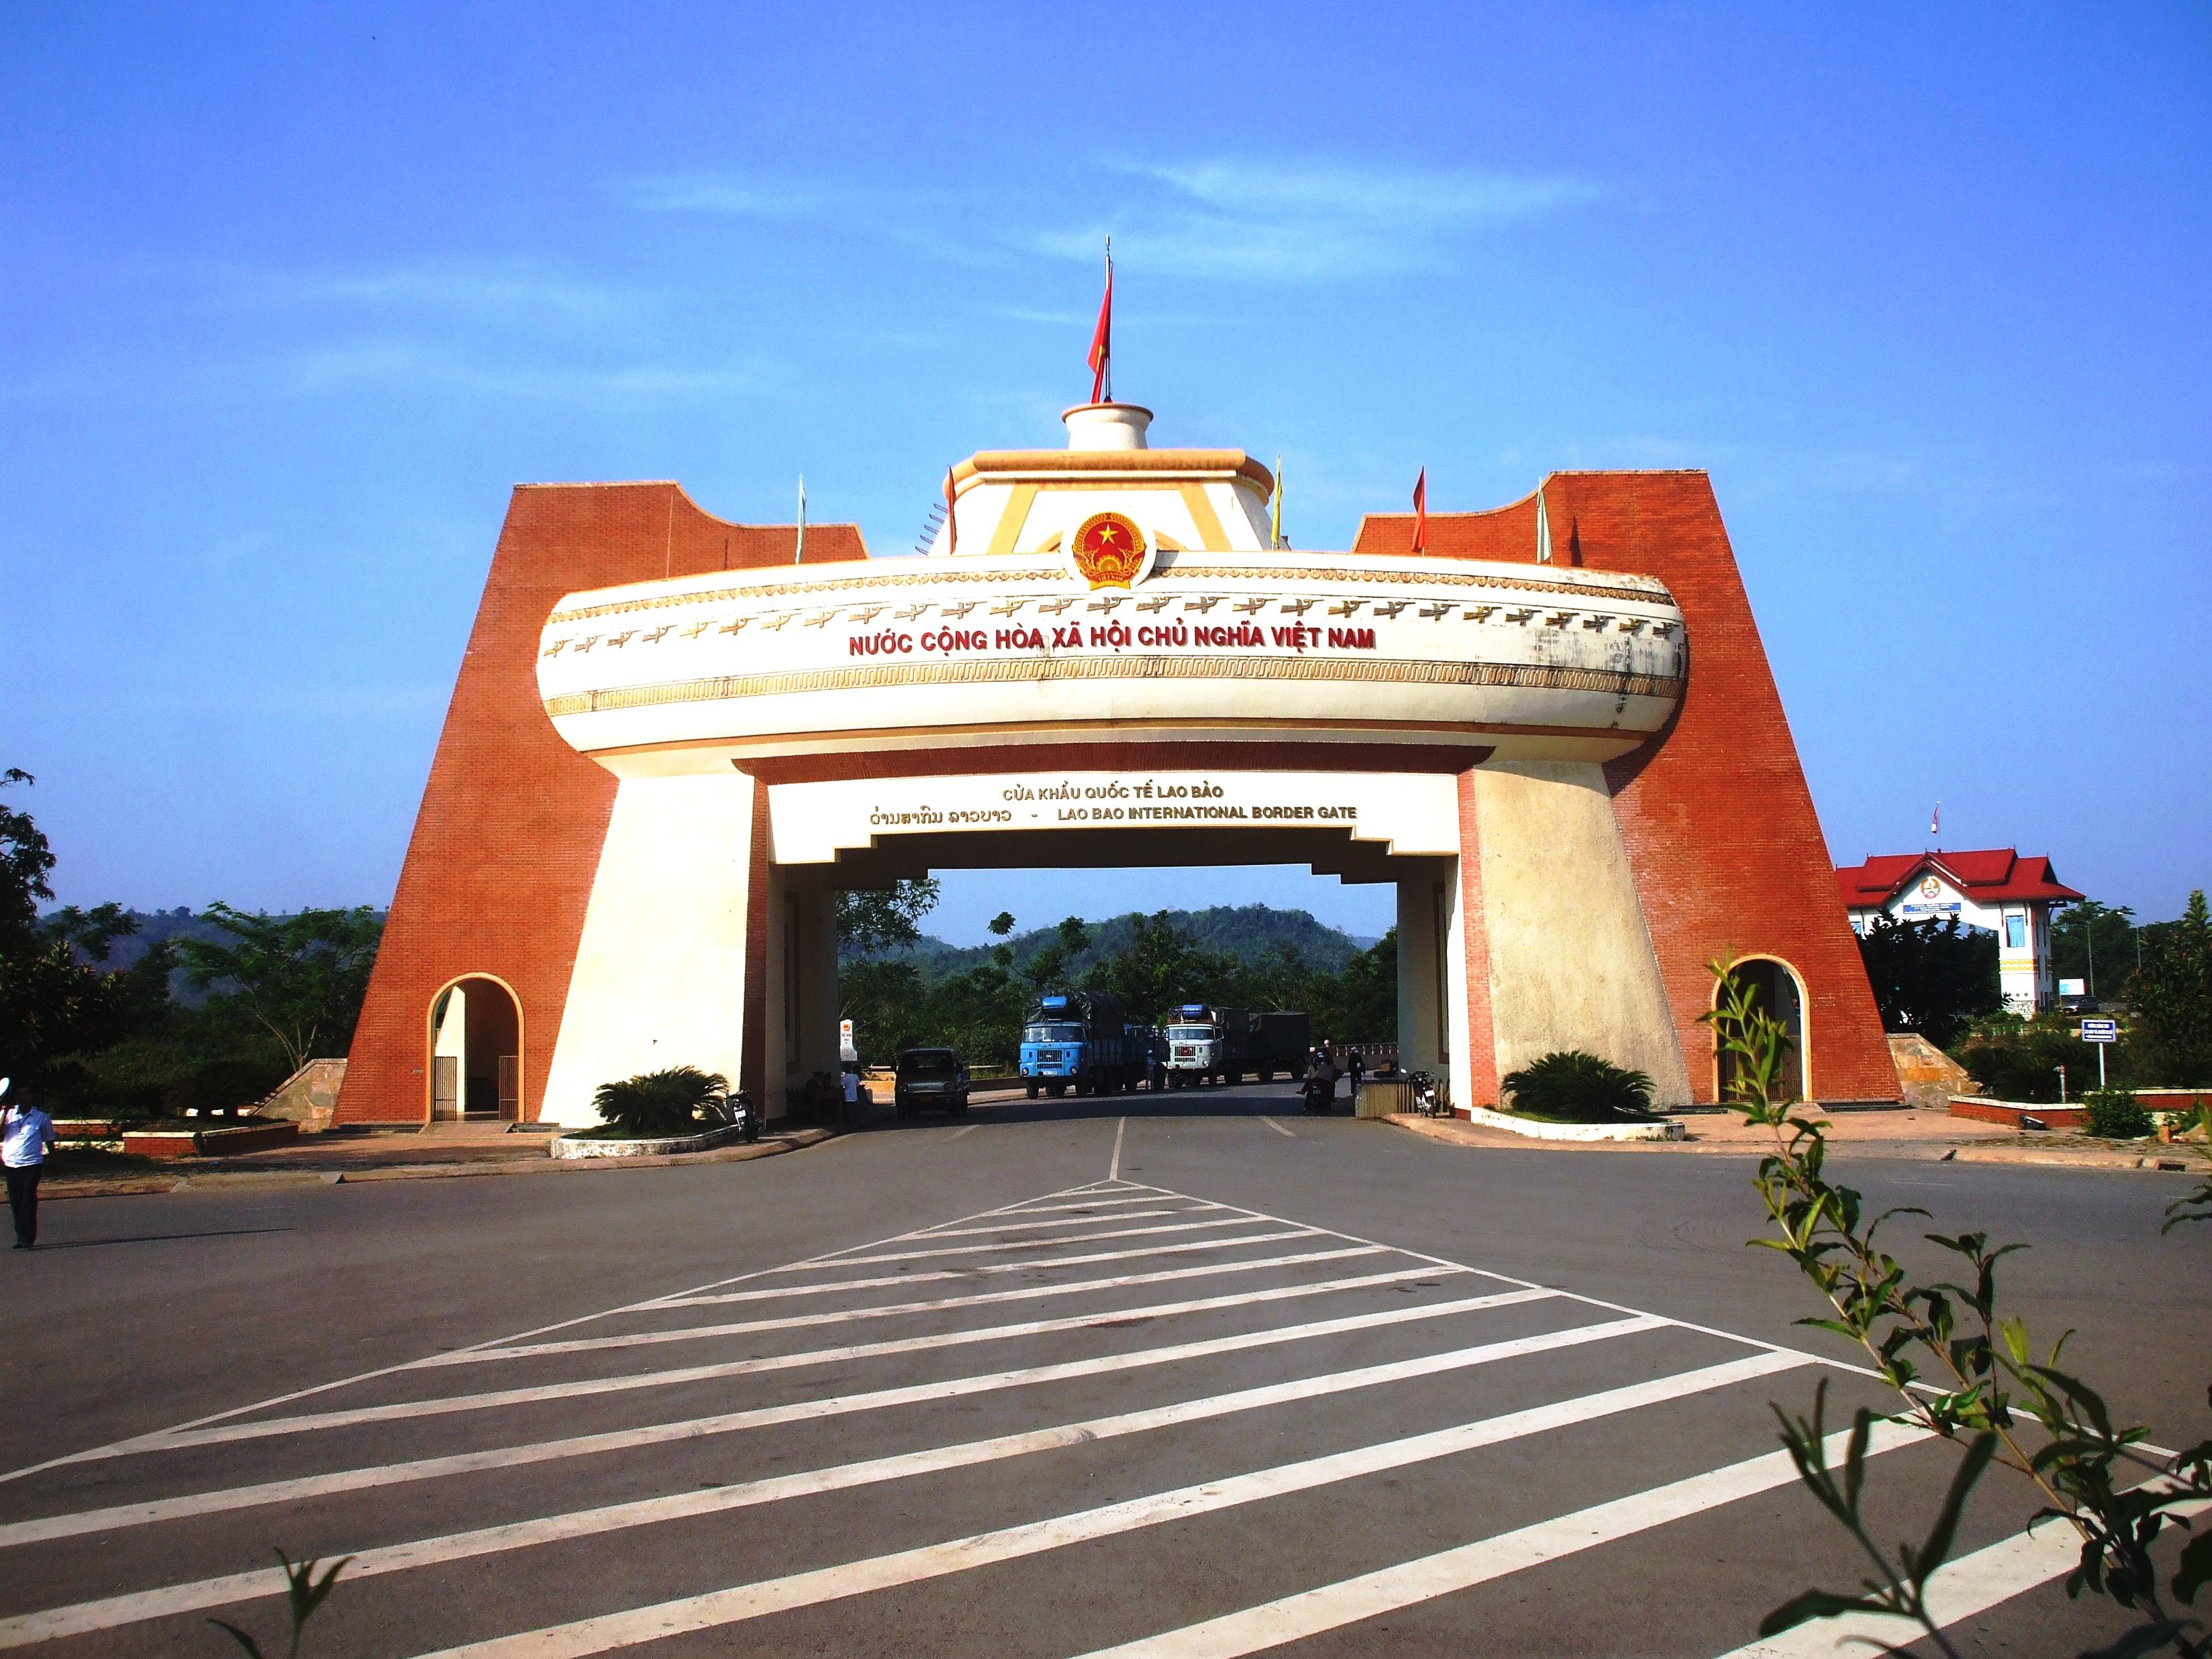 Cửa khẩu Lao Bảo: du lịch Quảng Trị